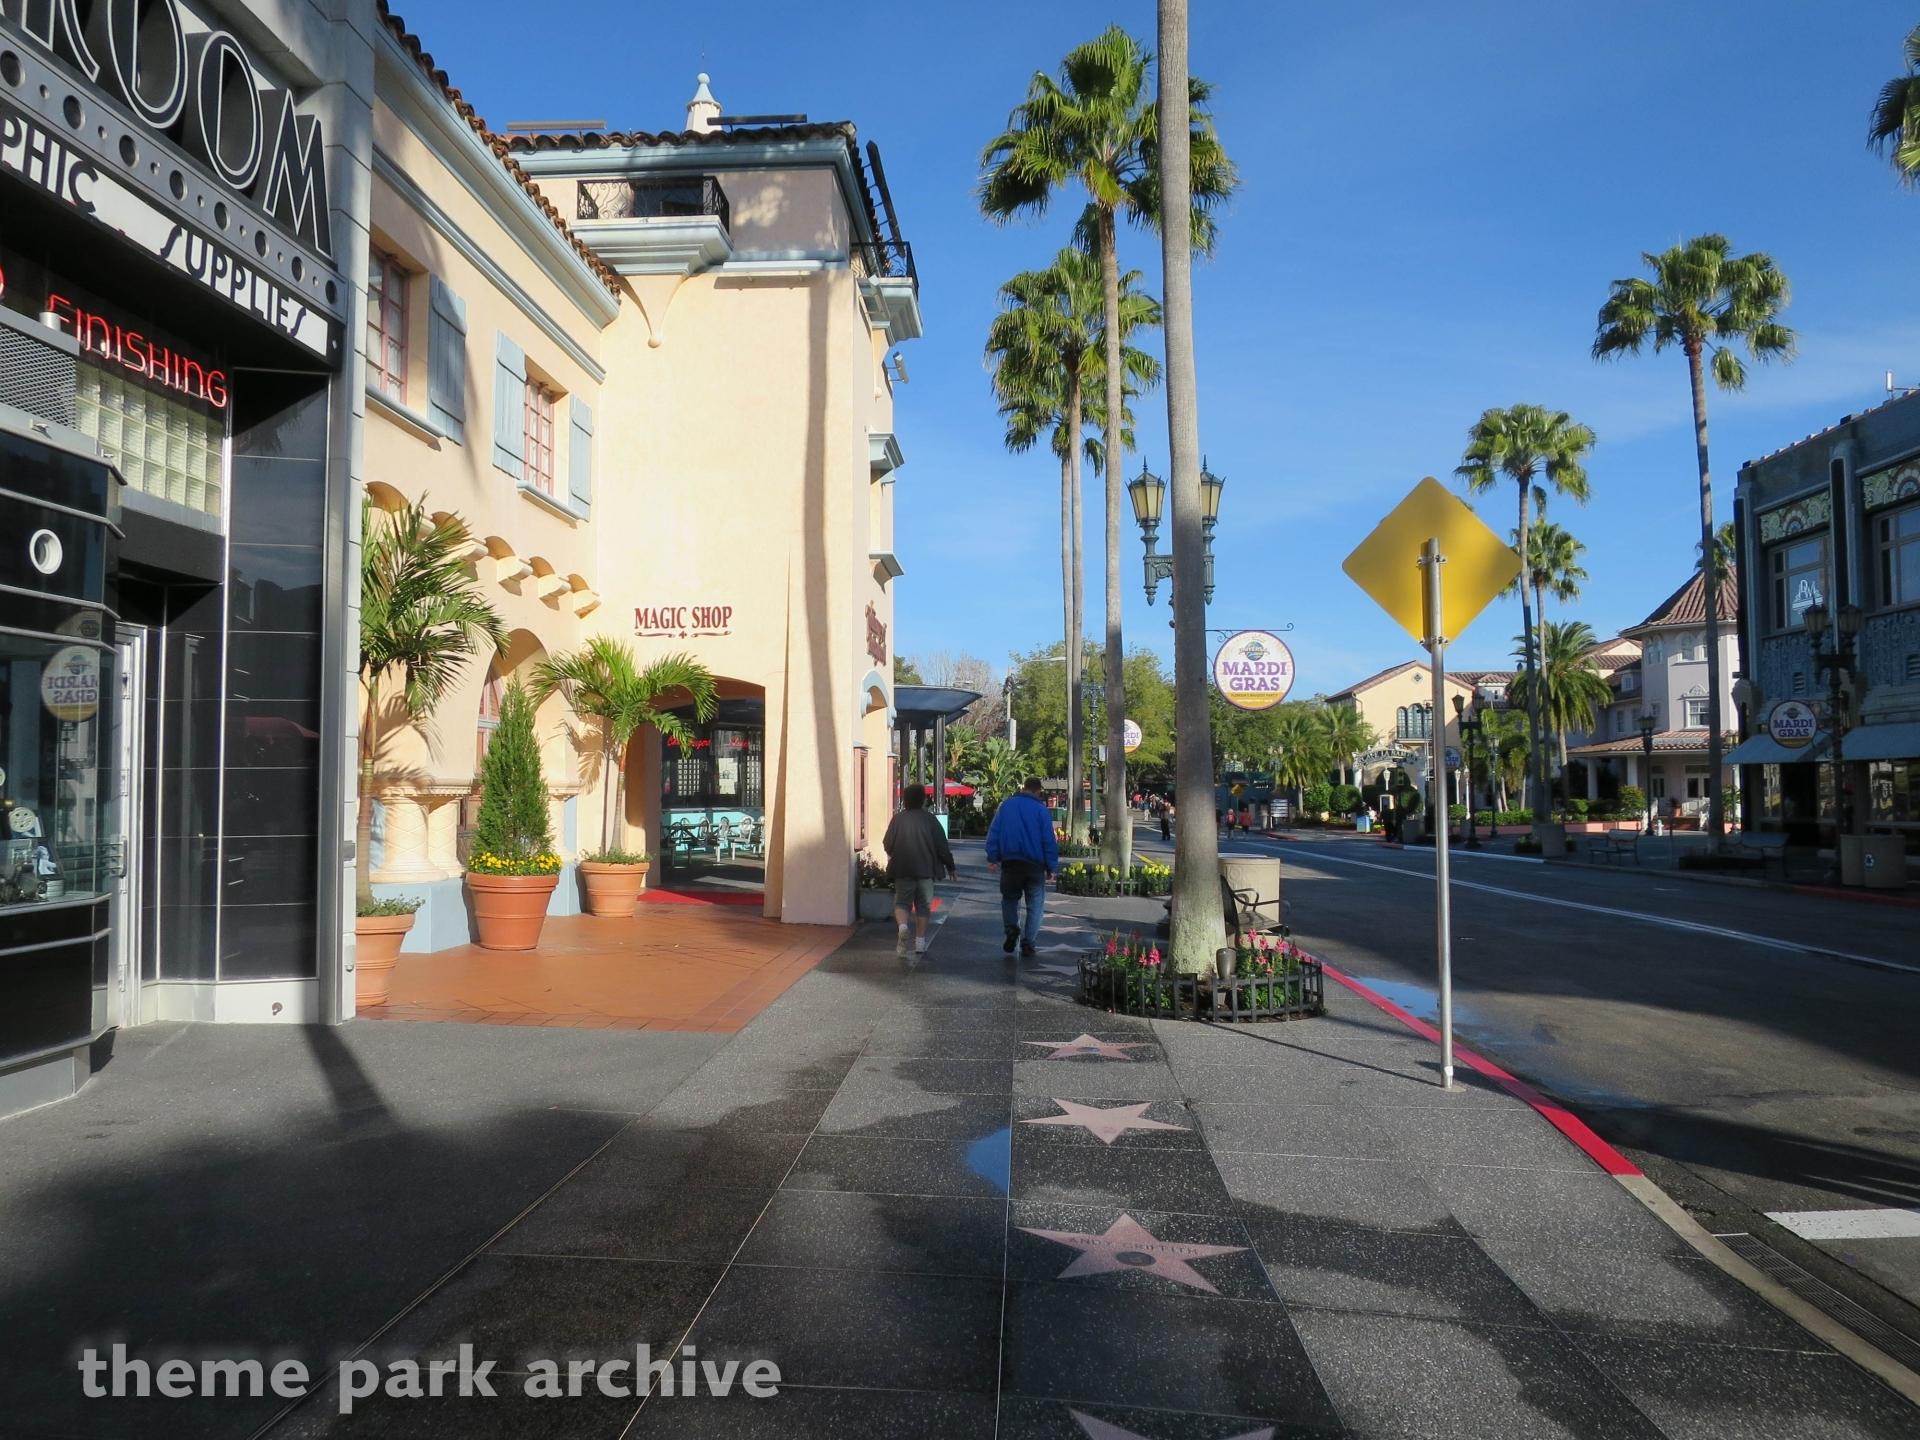 Production Central at Universal Studios Florida